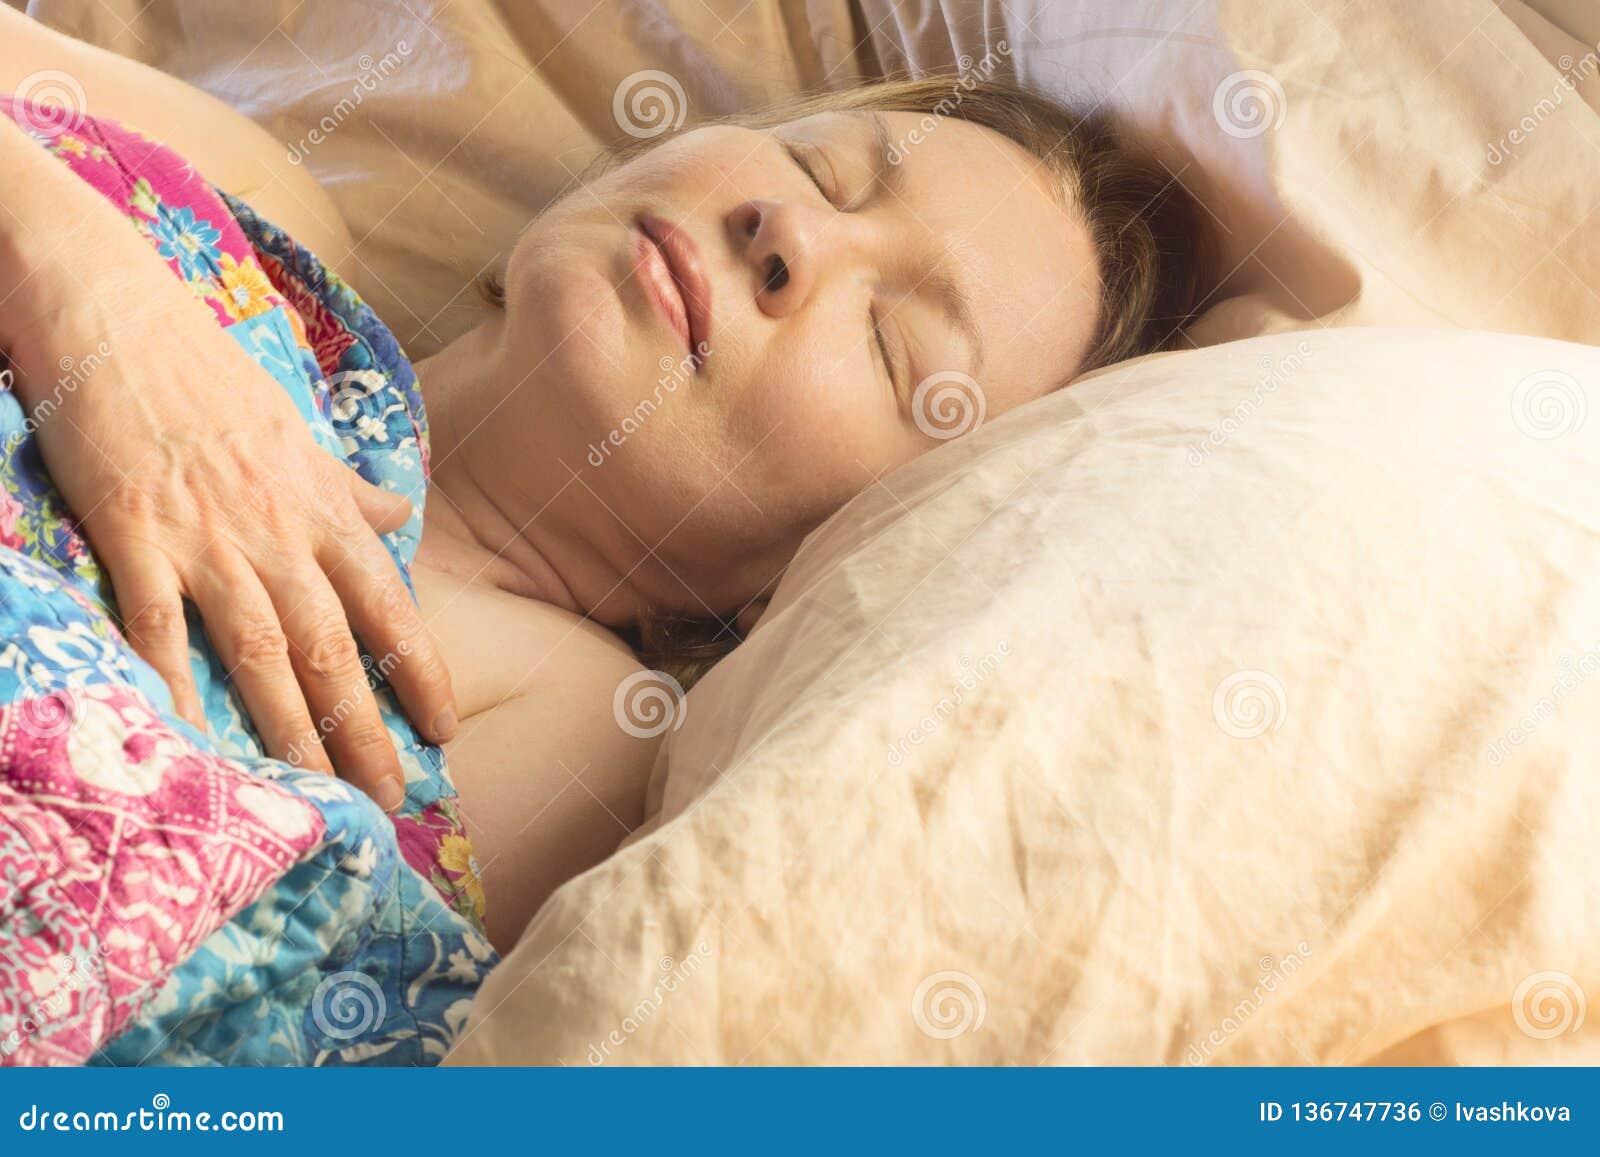 A wooman sleeping in